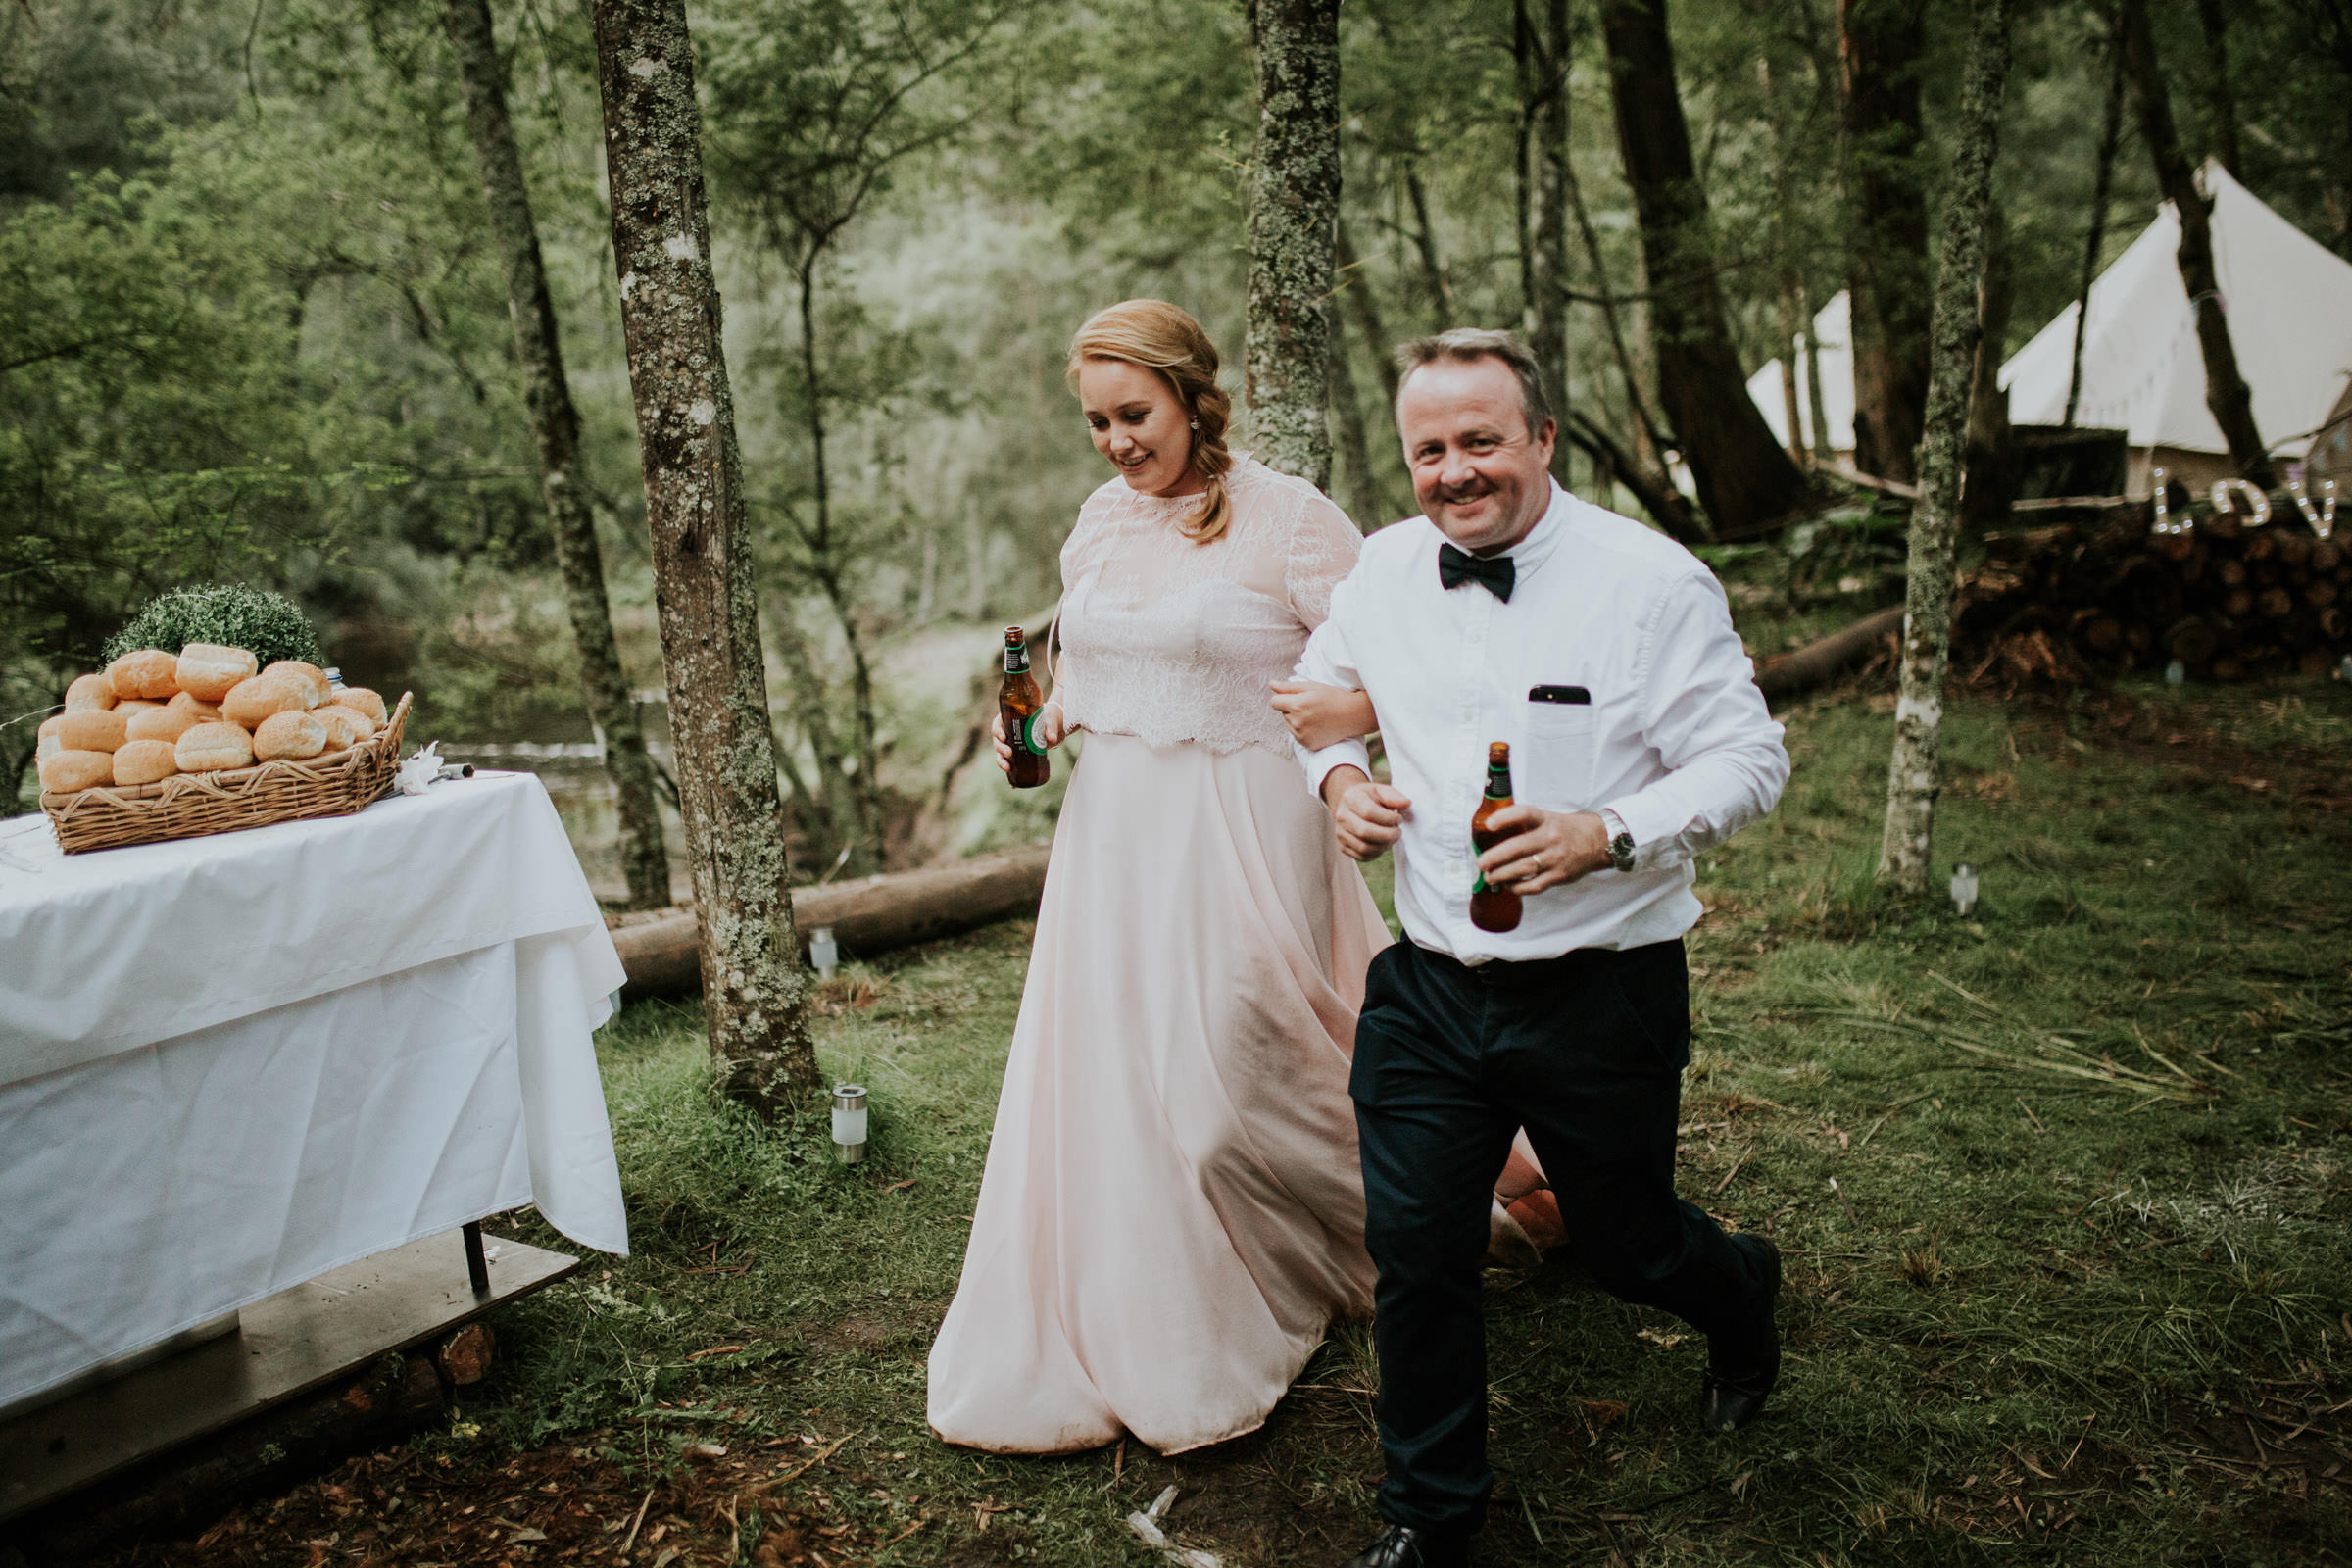 Emma+John+Far+South+Coast+Wedding+Festivl+Glamping+Bush-152.jpg